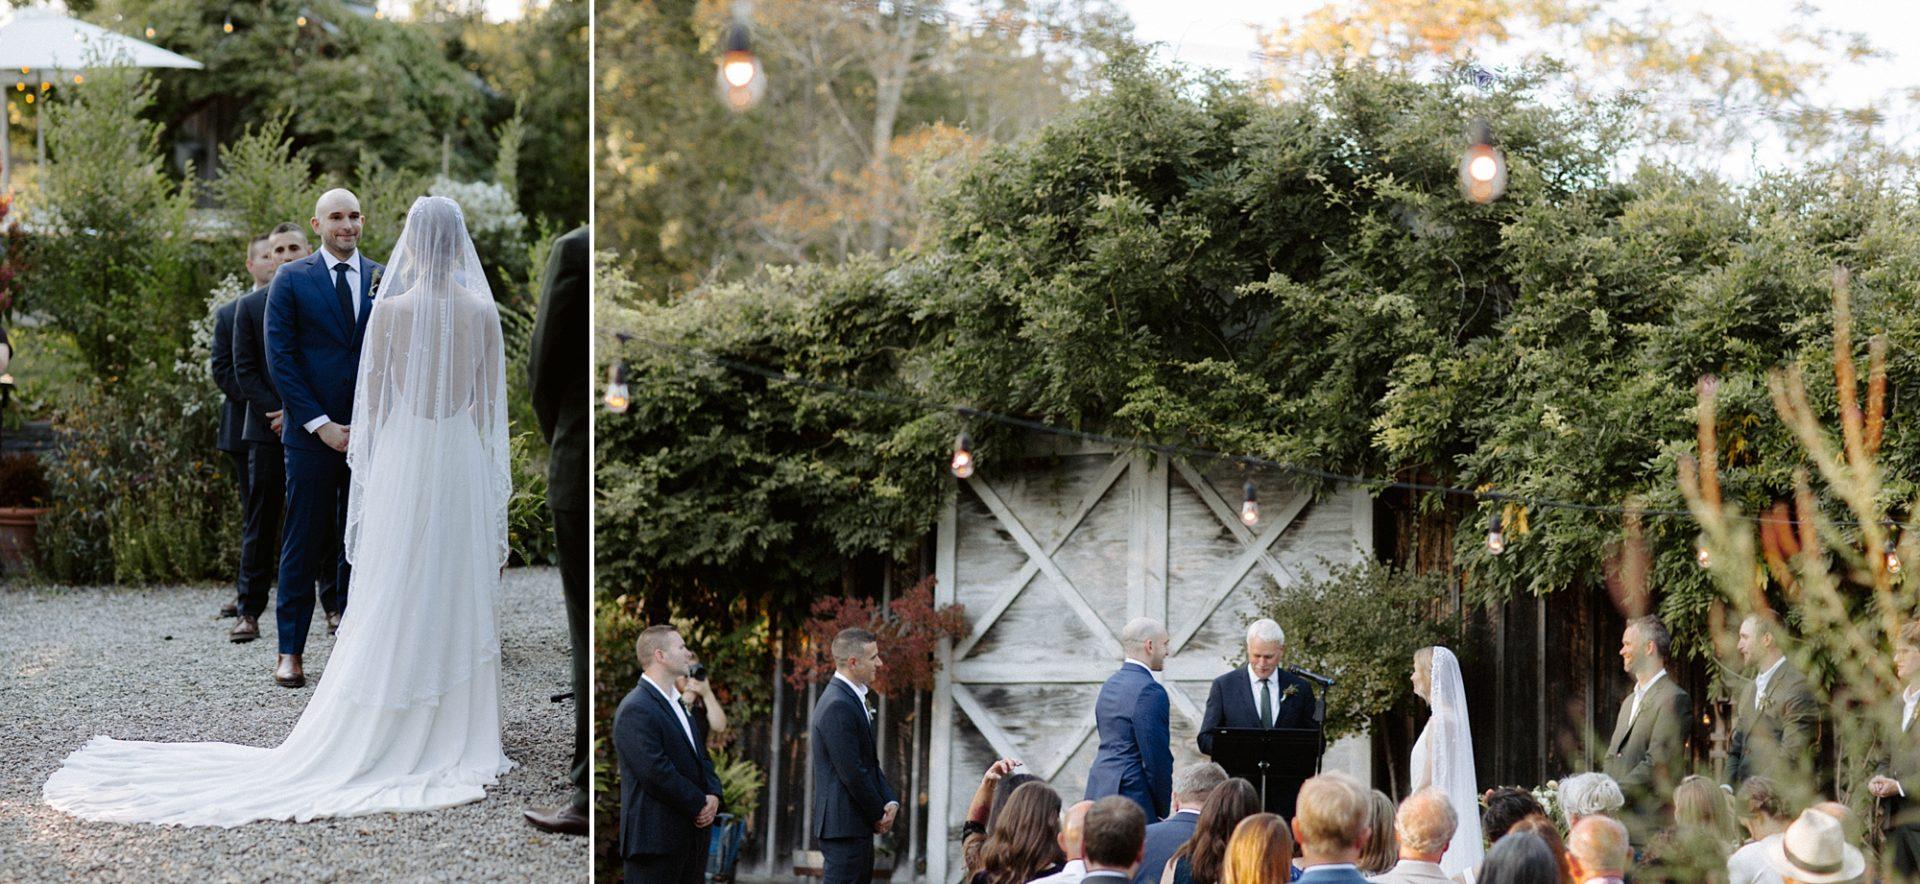 Wedding ceremony at M & D Farm